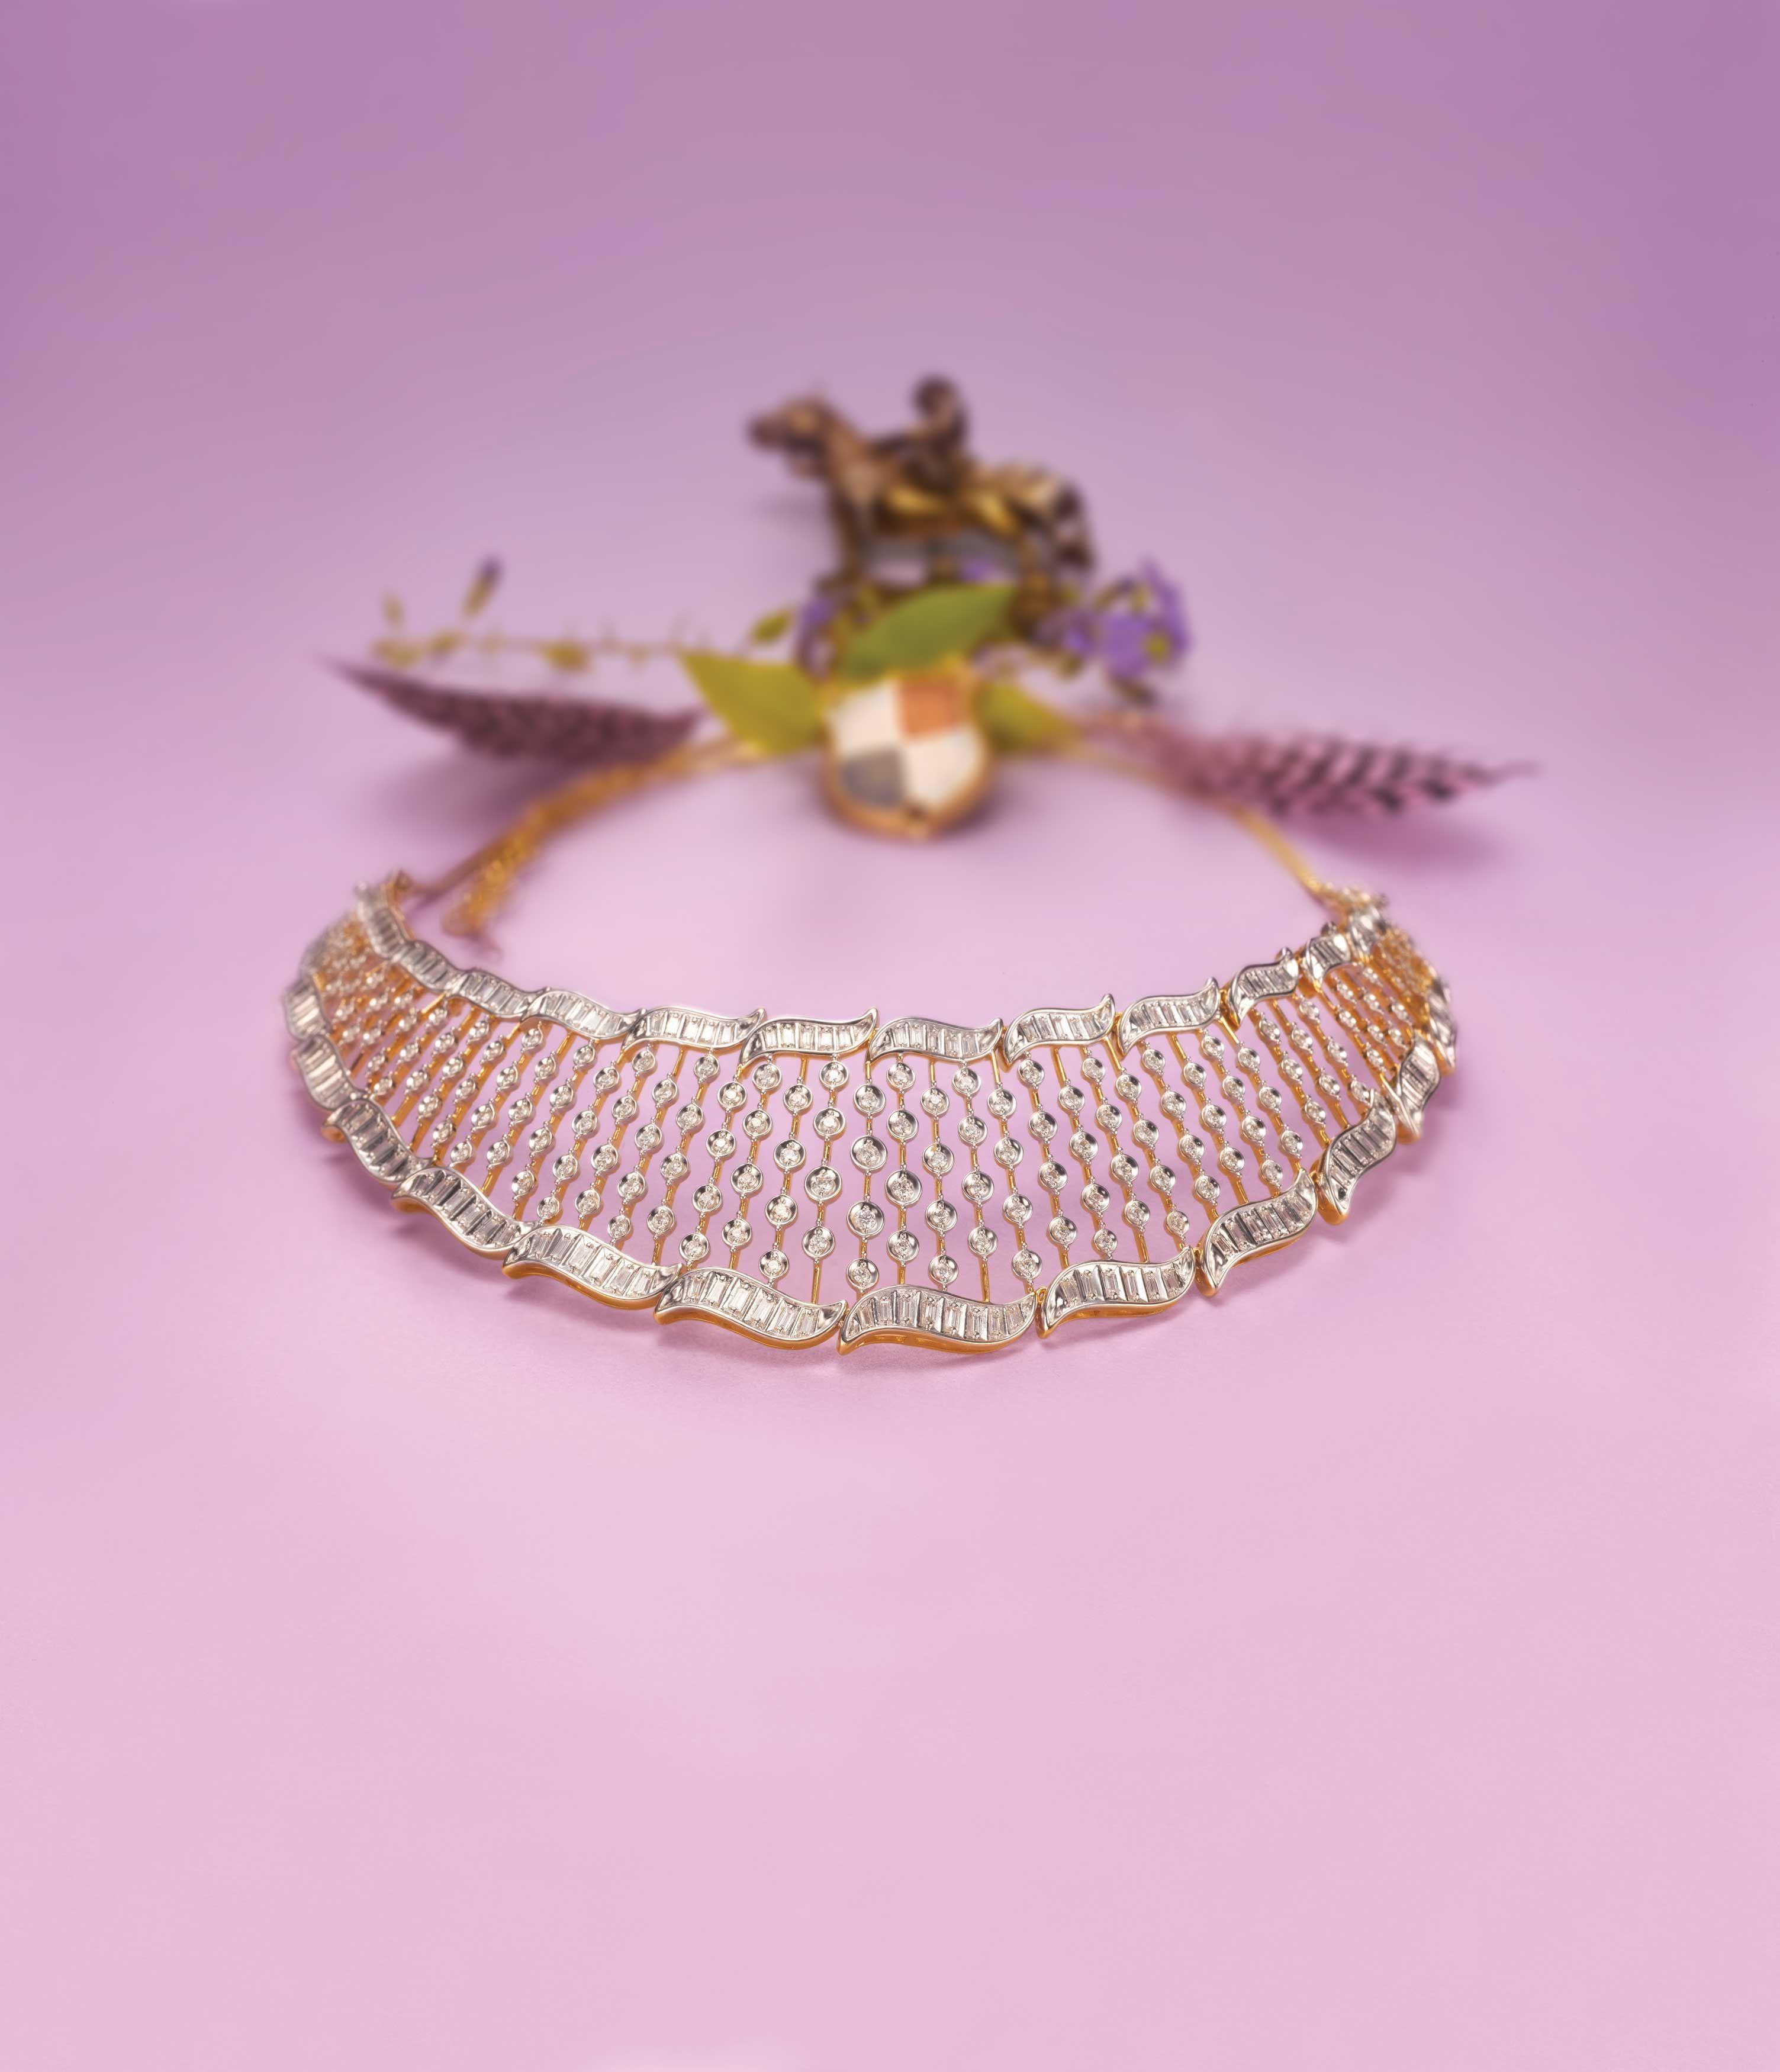 Diamond necklace indiandiamondnecklace radiant necklaces